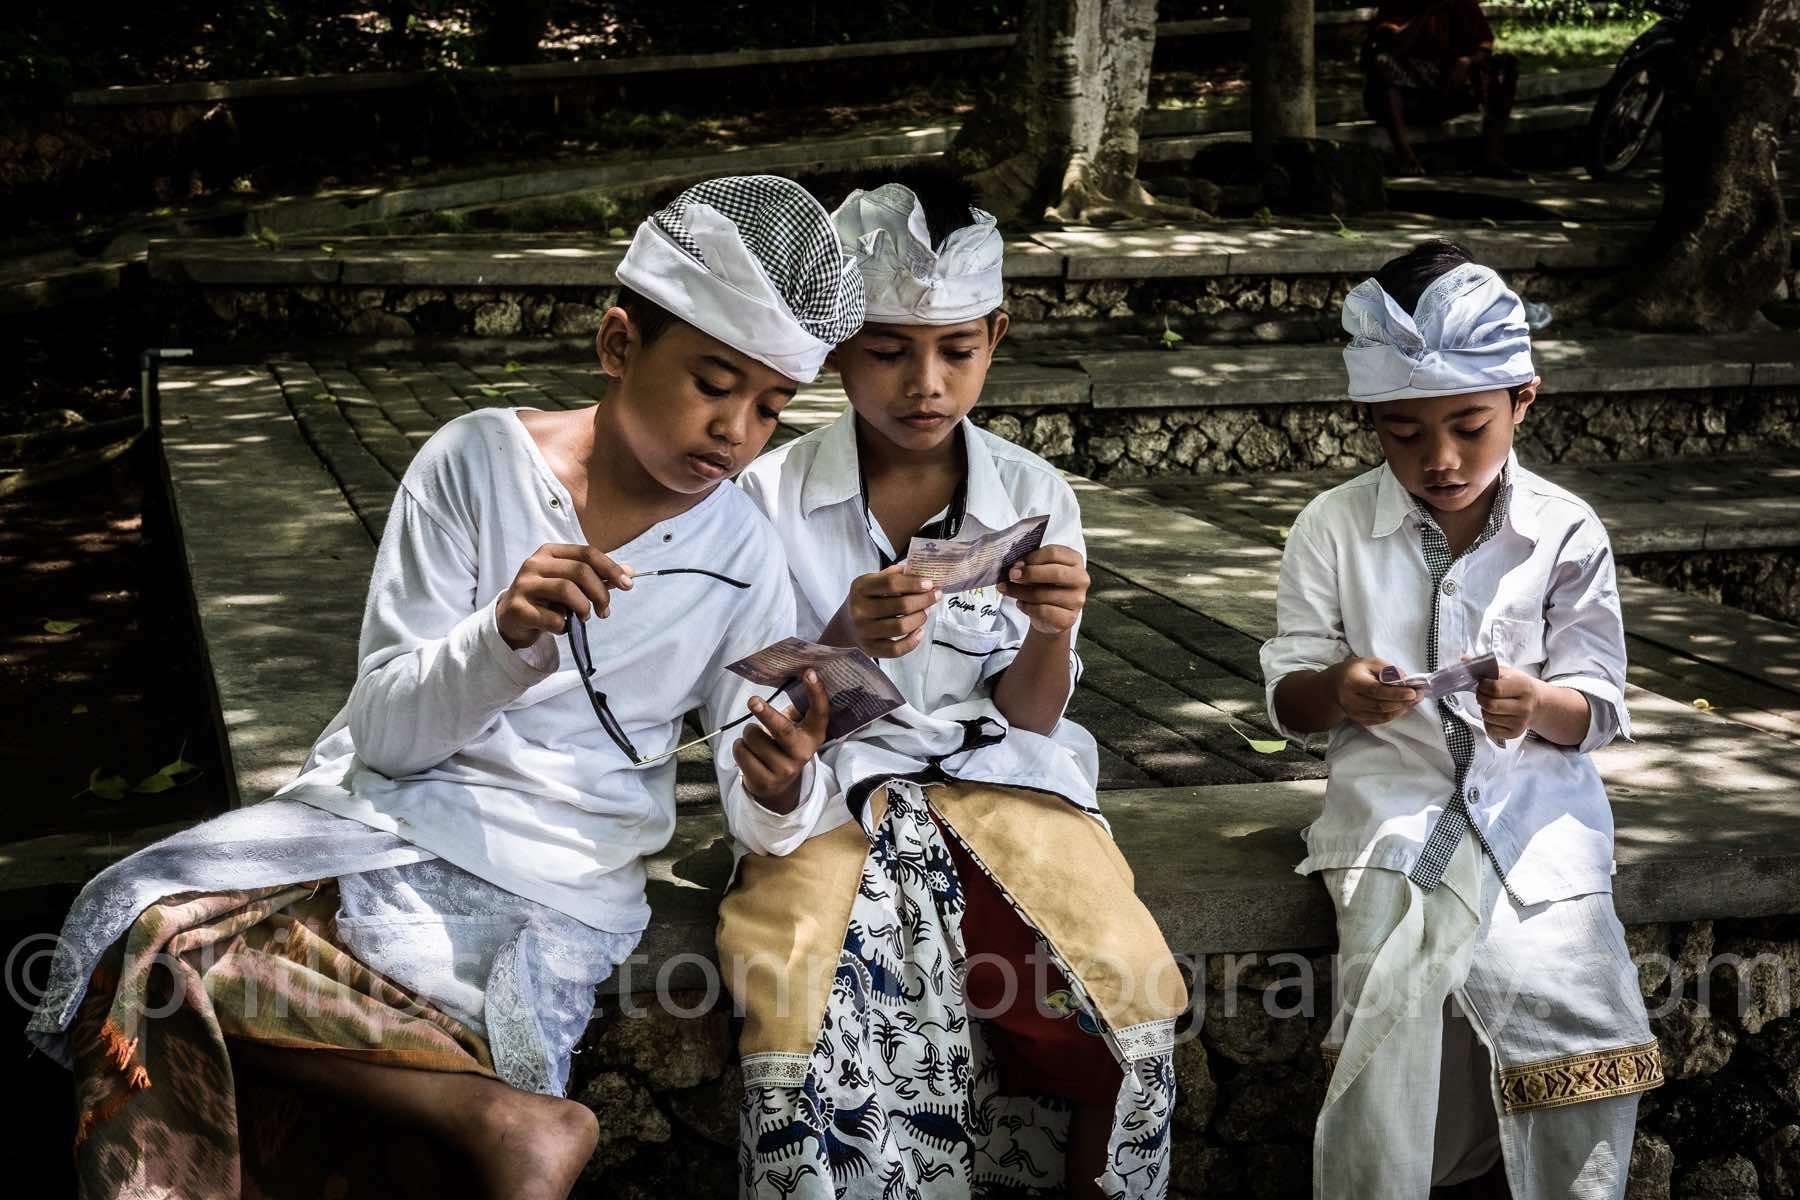 Three Little 'Merchants'